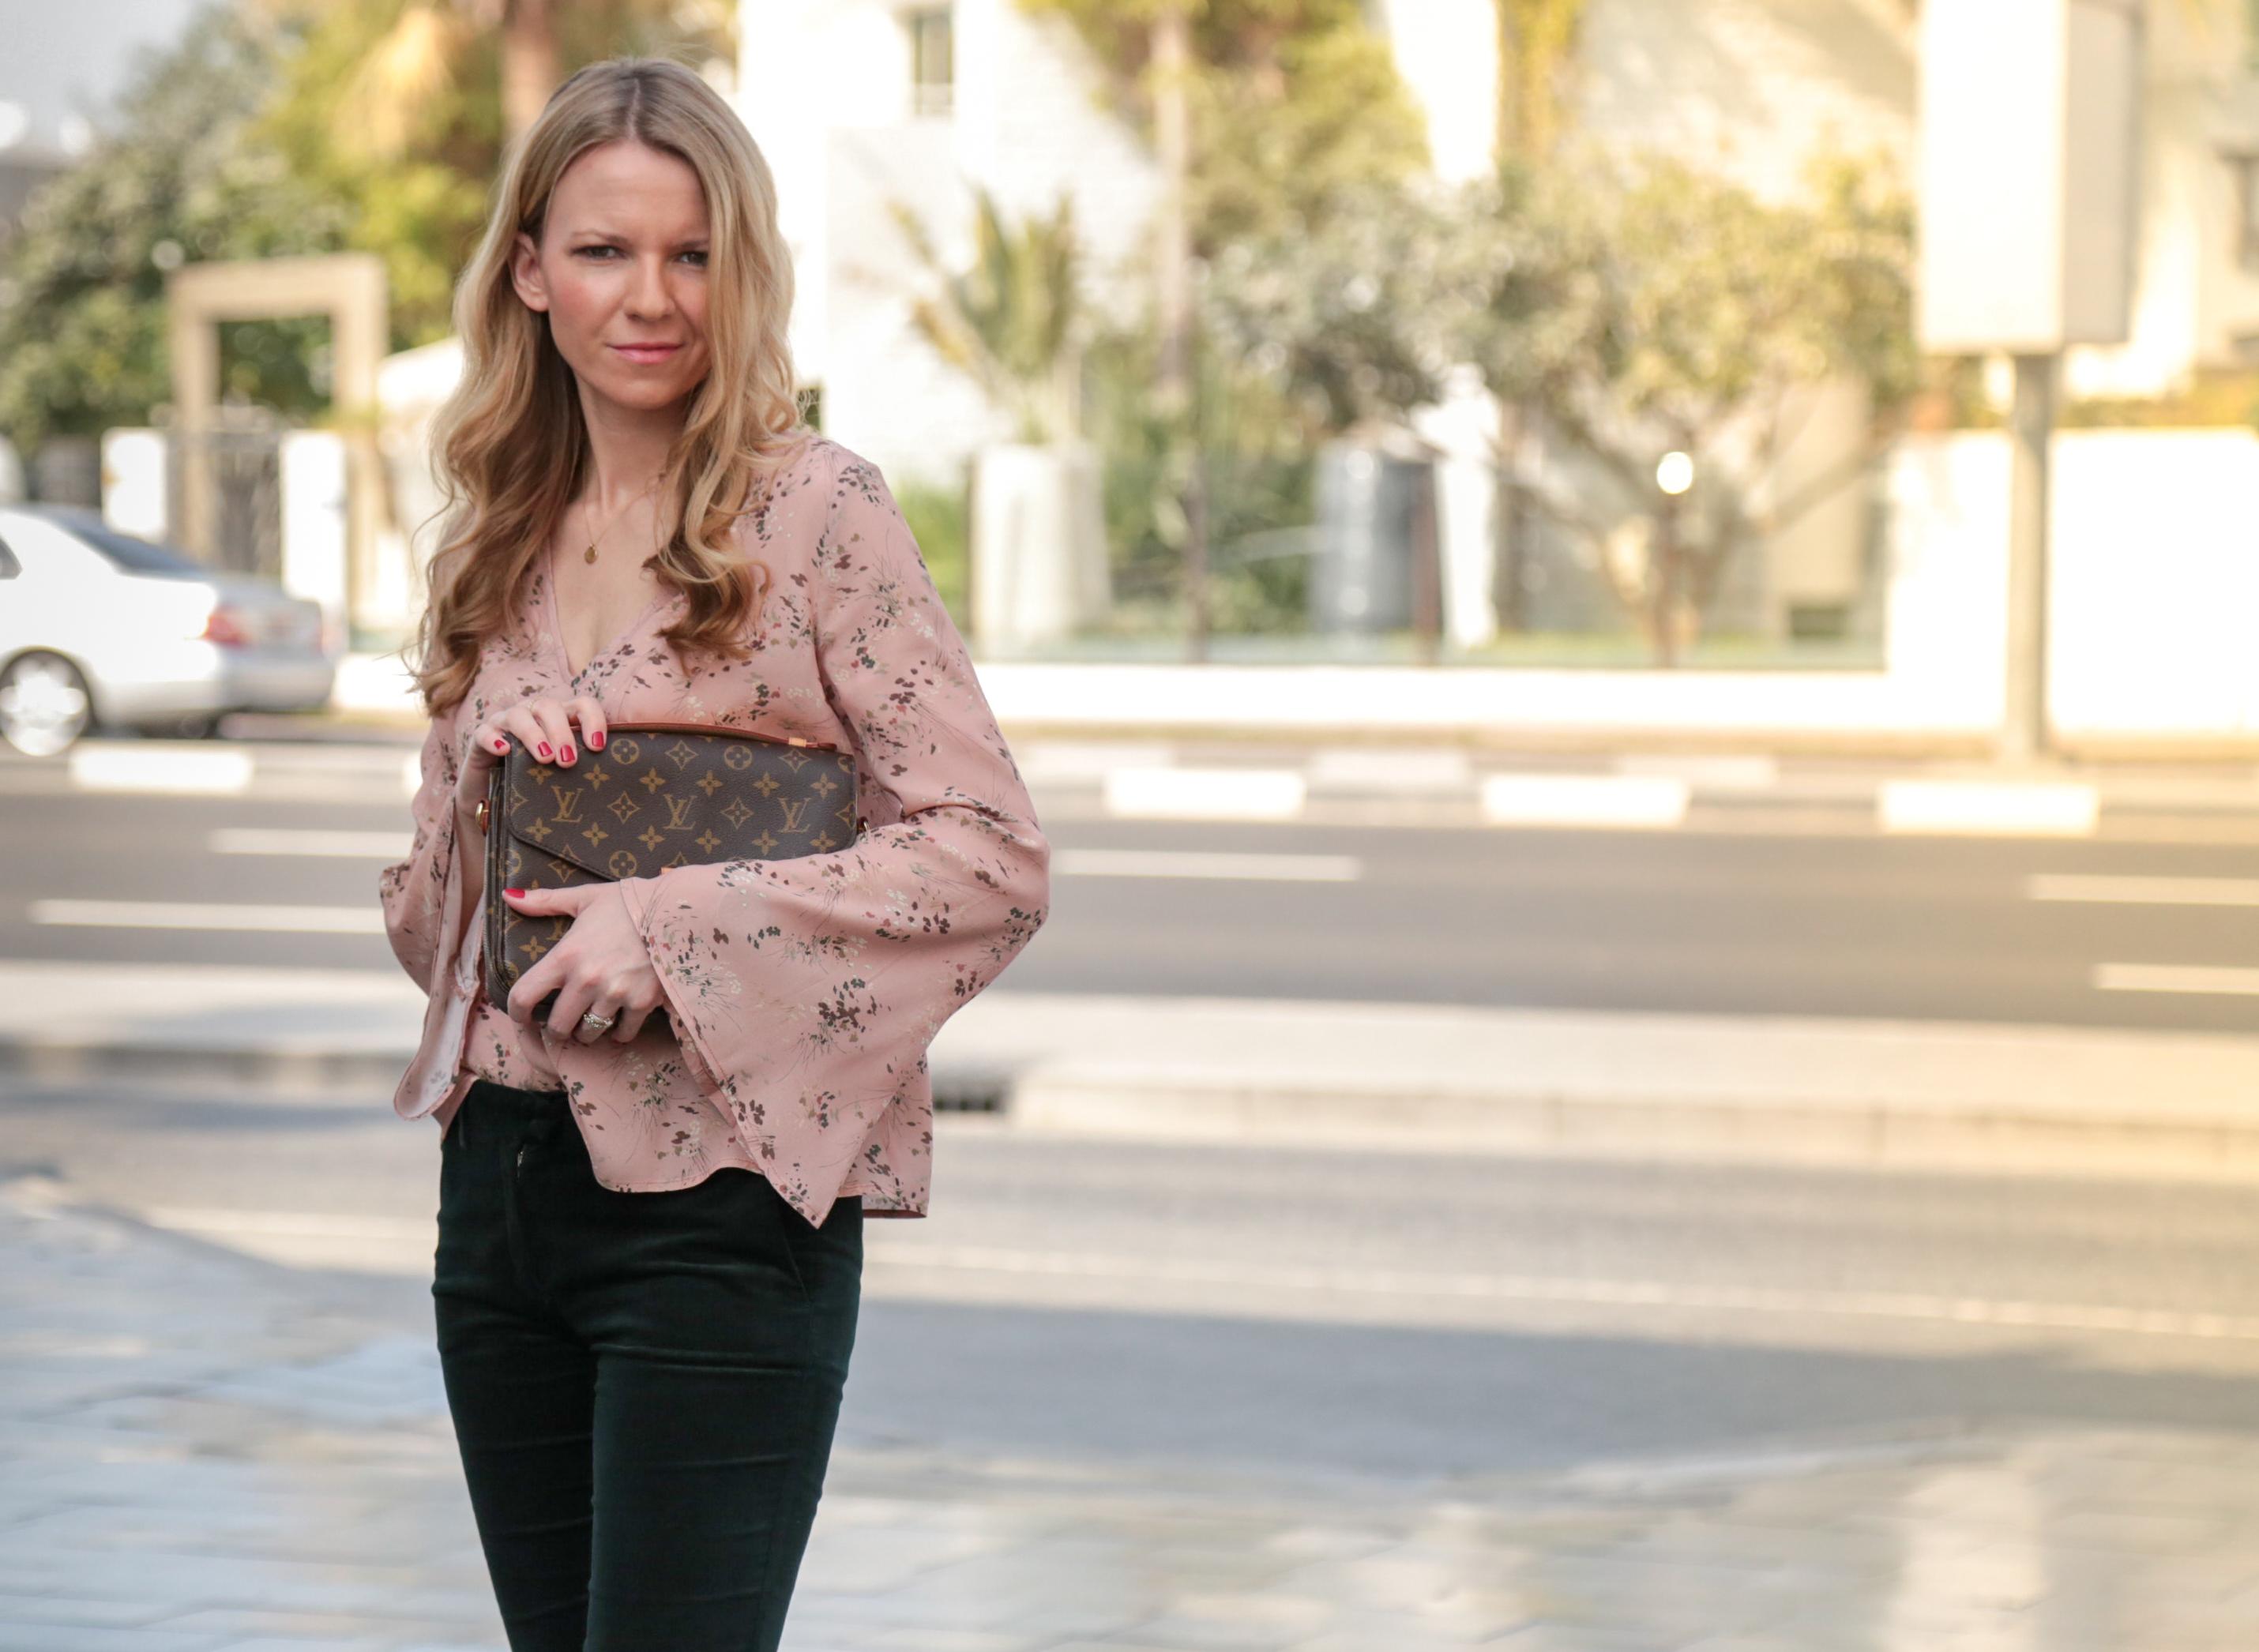 Golden Hour Outfit im Boxpark Dubai Fashion Lifestyle Jennifer PepperAndGold Dubai DubaiOutfit Jumeirah Louis Vuitton LV LVOE Metis Highheels Mango Asos Pochette